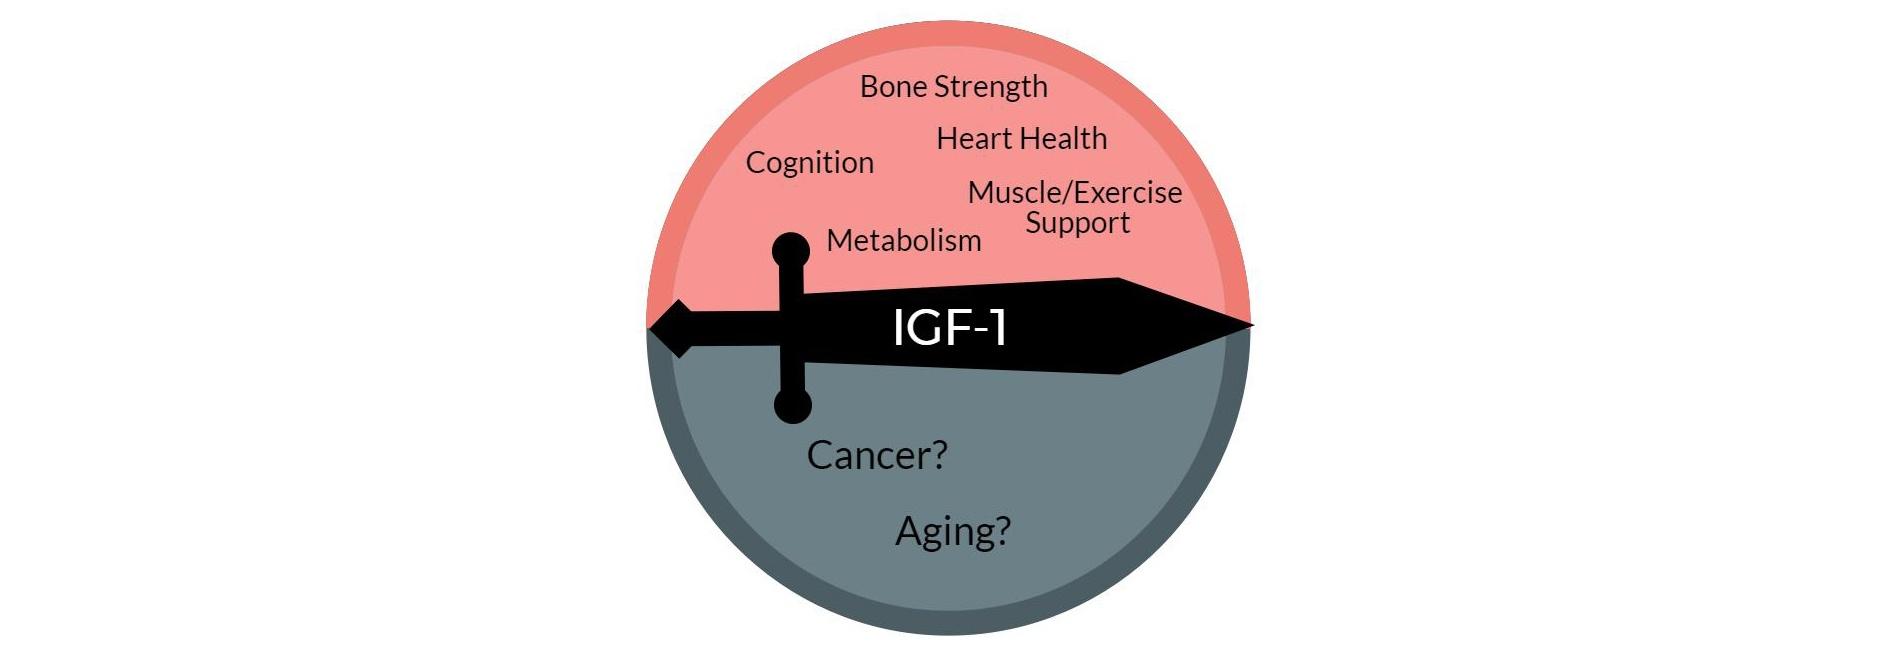 IGF-1 - The Complex Double-Edged Sword of Health